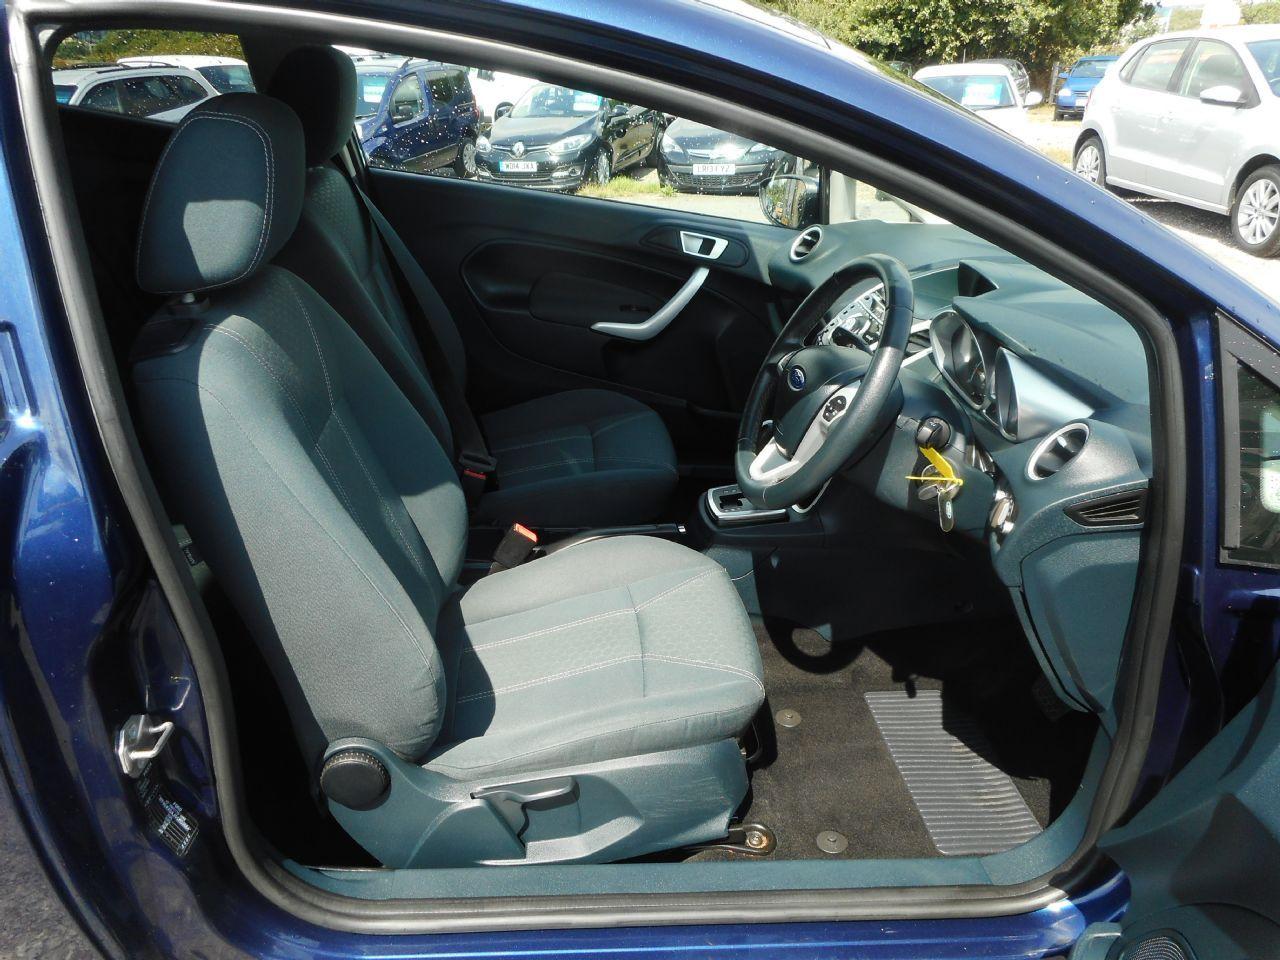 FORD Fiesta Titanium 1.4 096 Auto (2012) - Picture 11